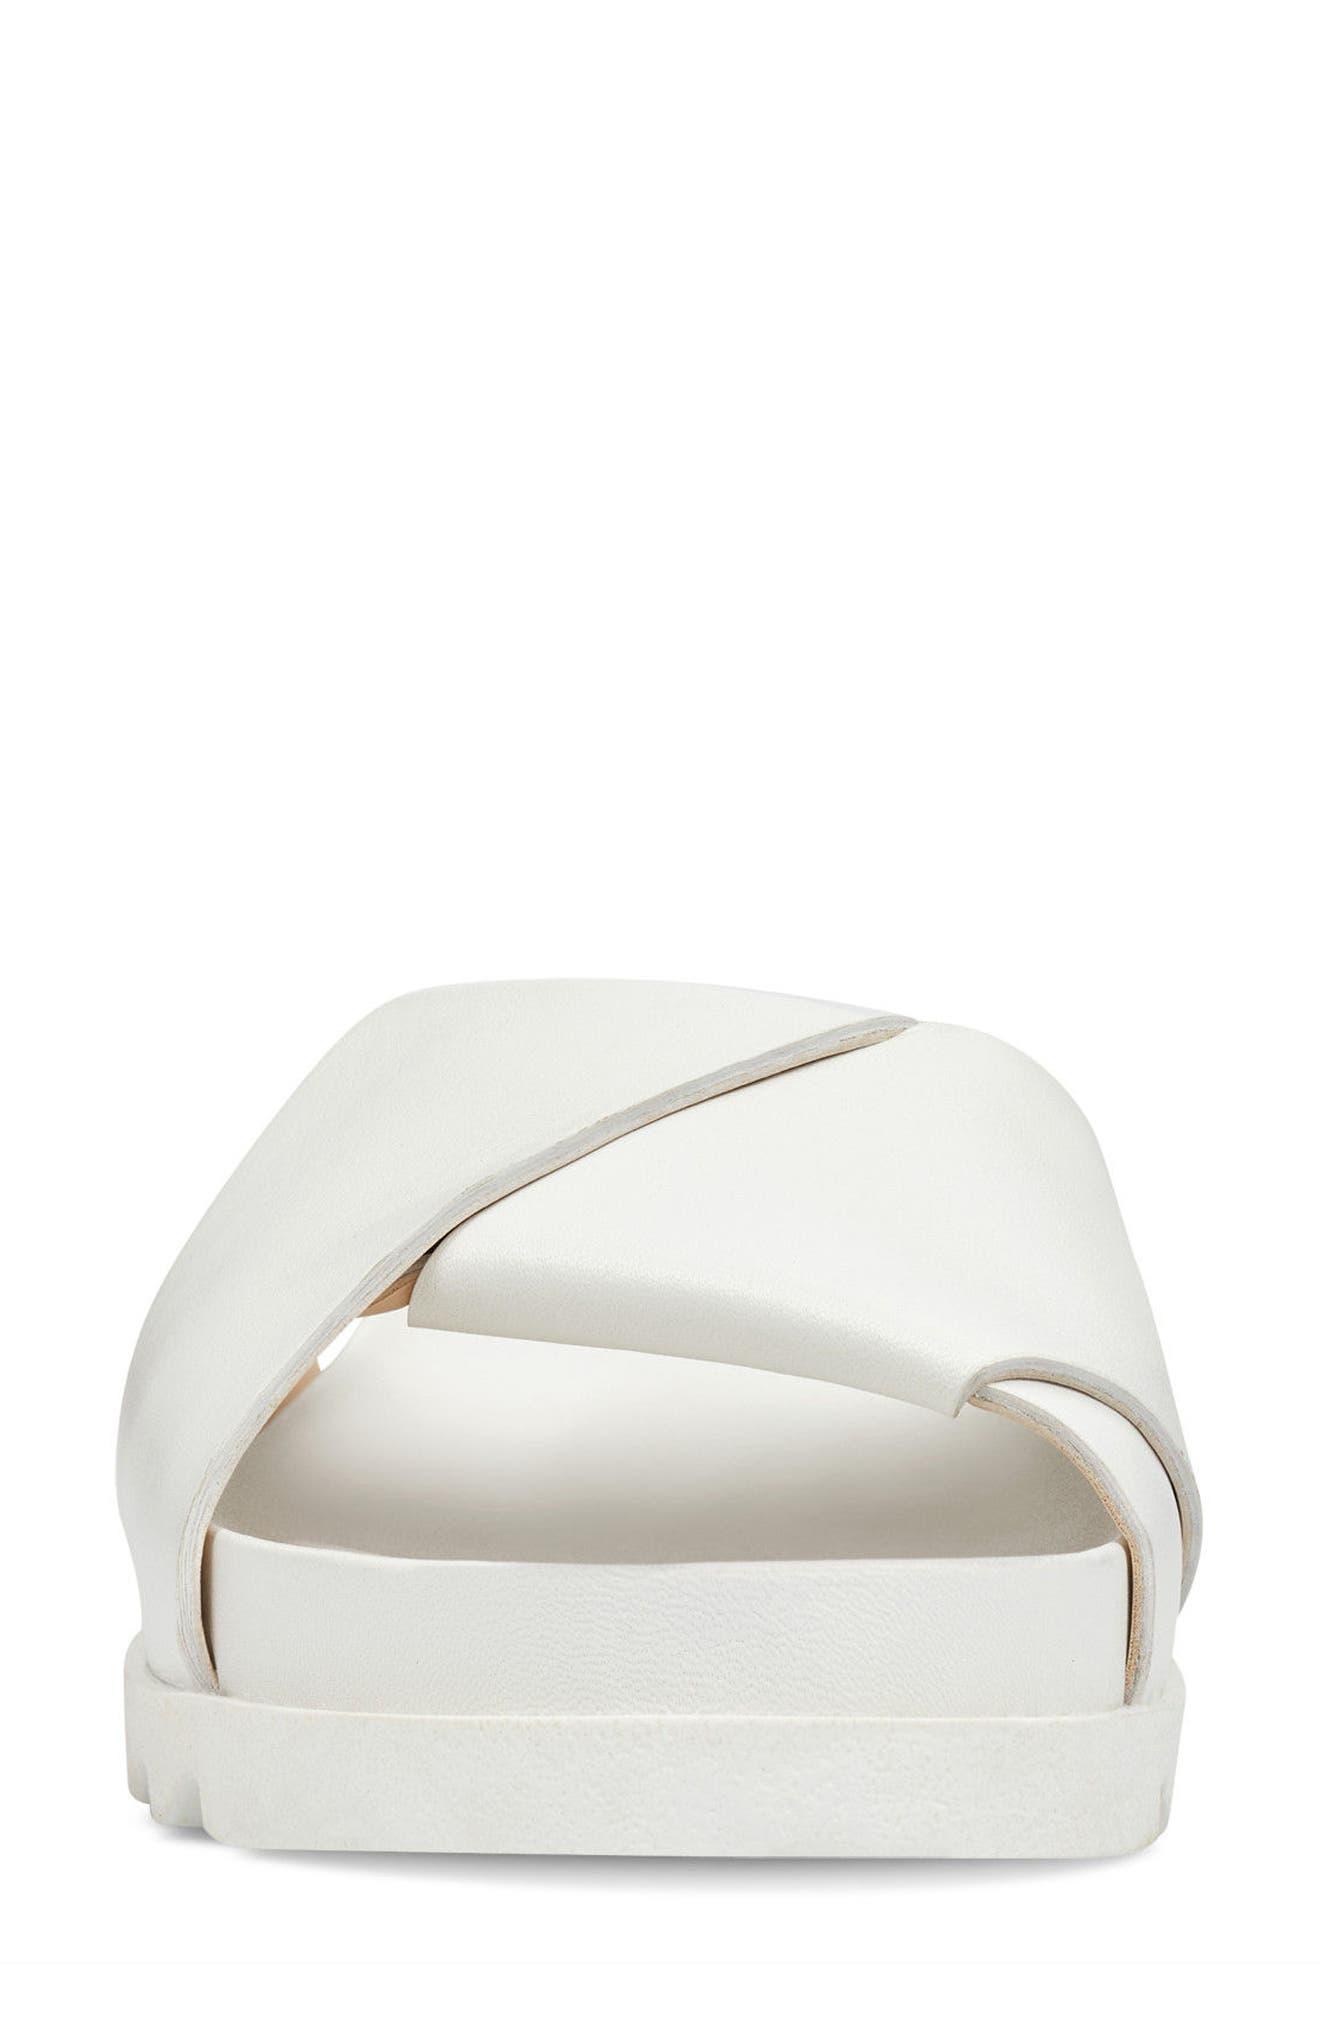 Furaish Slide Sandal,                             Alternate thumbnail 4, color,                             White Leather